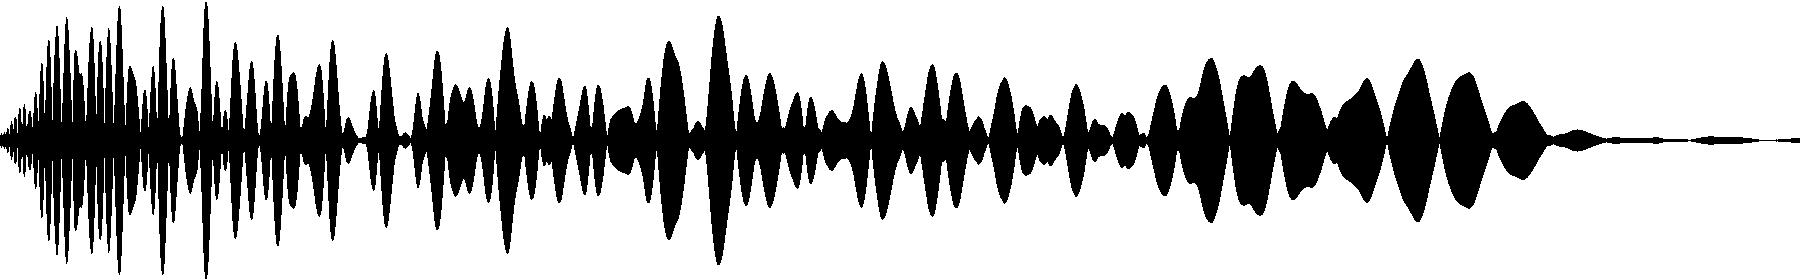 vedh bass cut 099 g